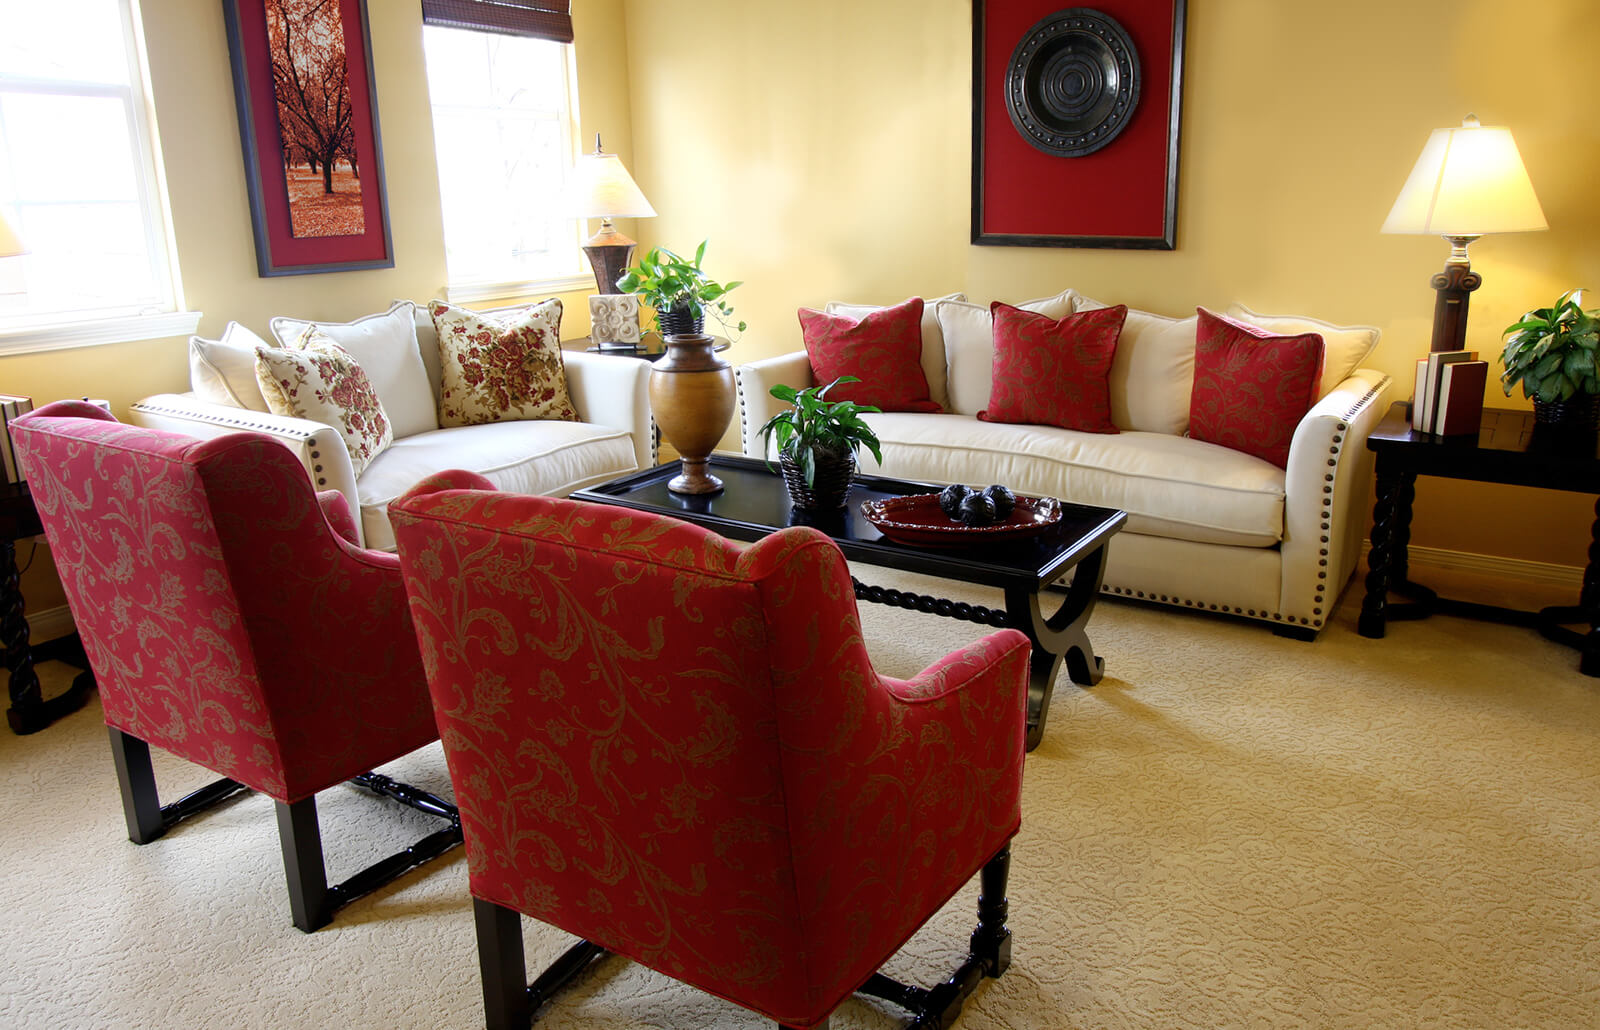 Feng Shui Tips for Choosing Living Room Furniture | LoveToKnow